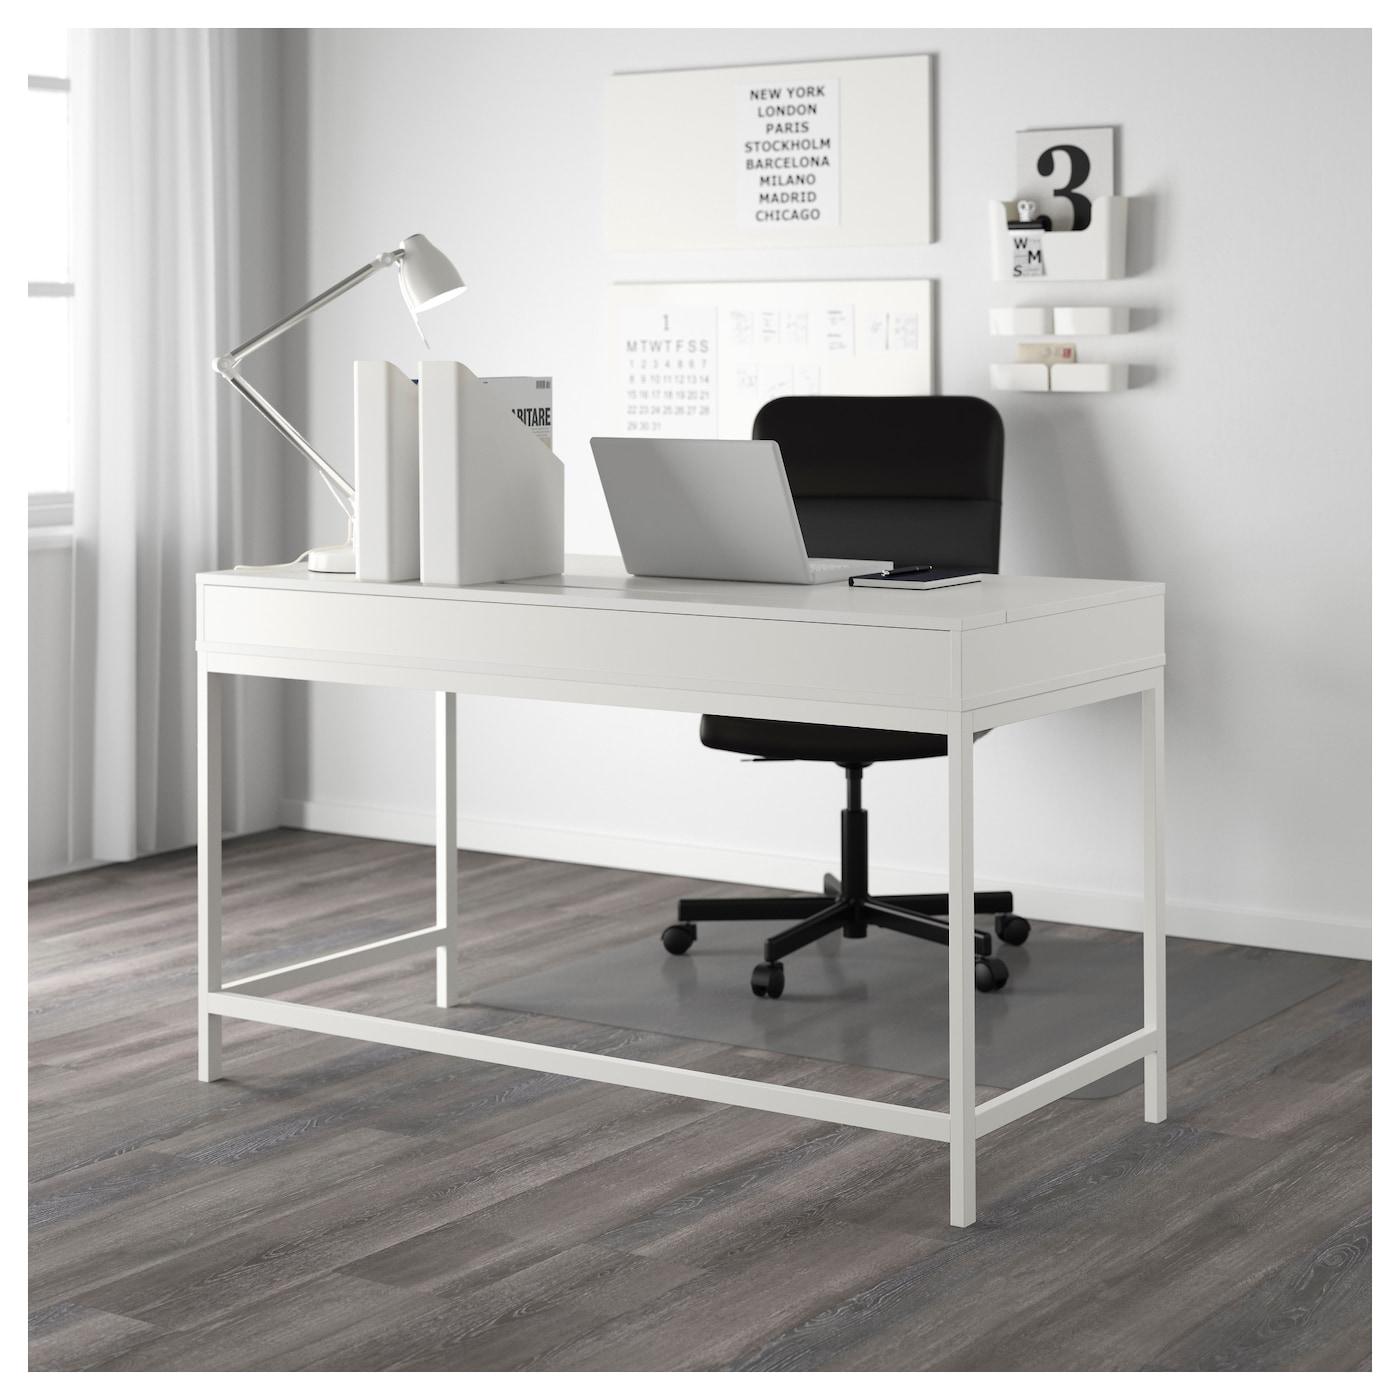 alex desk white 131 x 60 cm ikea. Black Bedroom Furniture Sets. Home Design Ideas